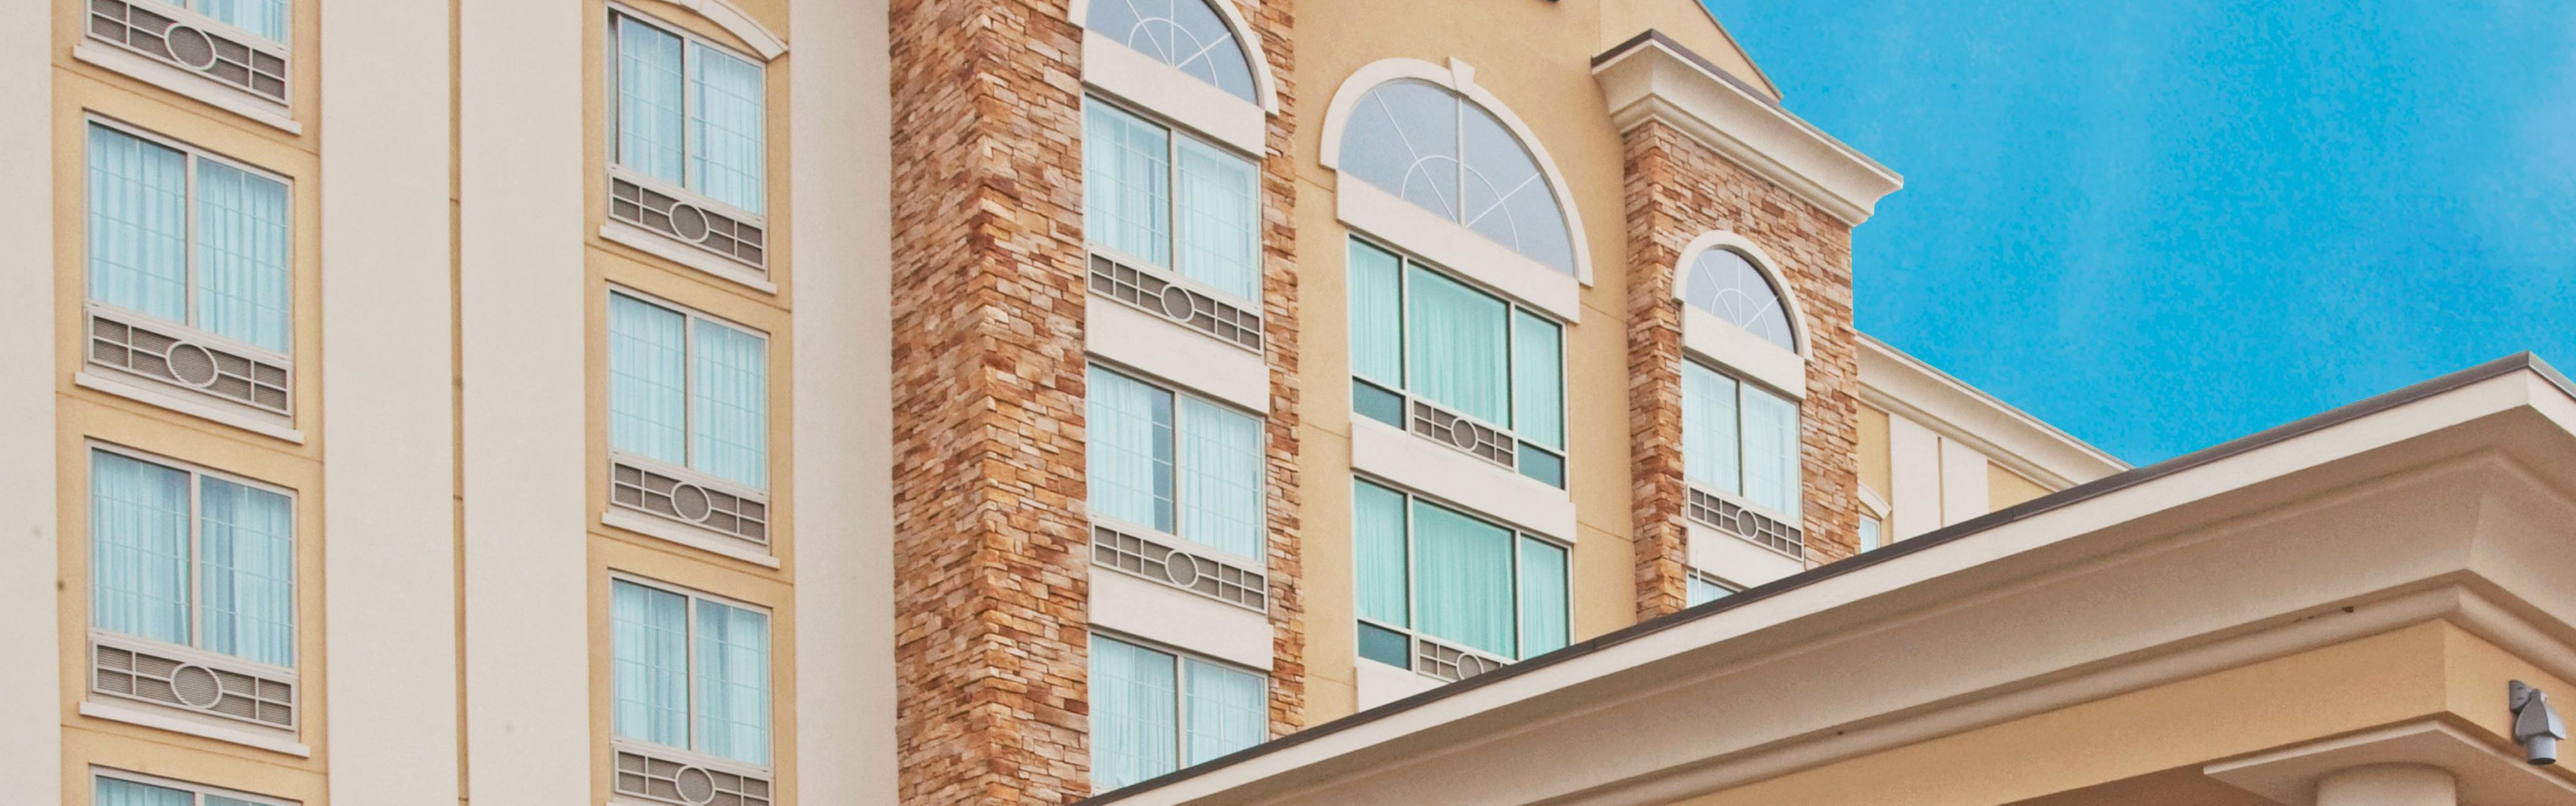 Holiday Inn Express & Suites Columbus At Northlake image 0